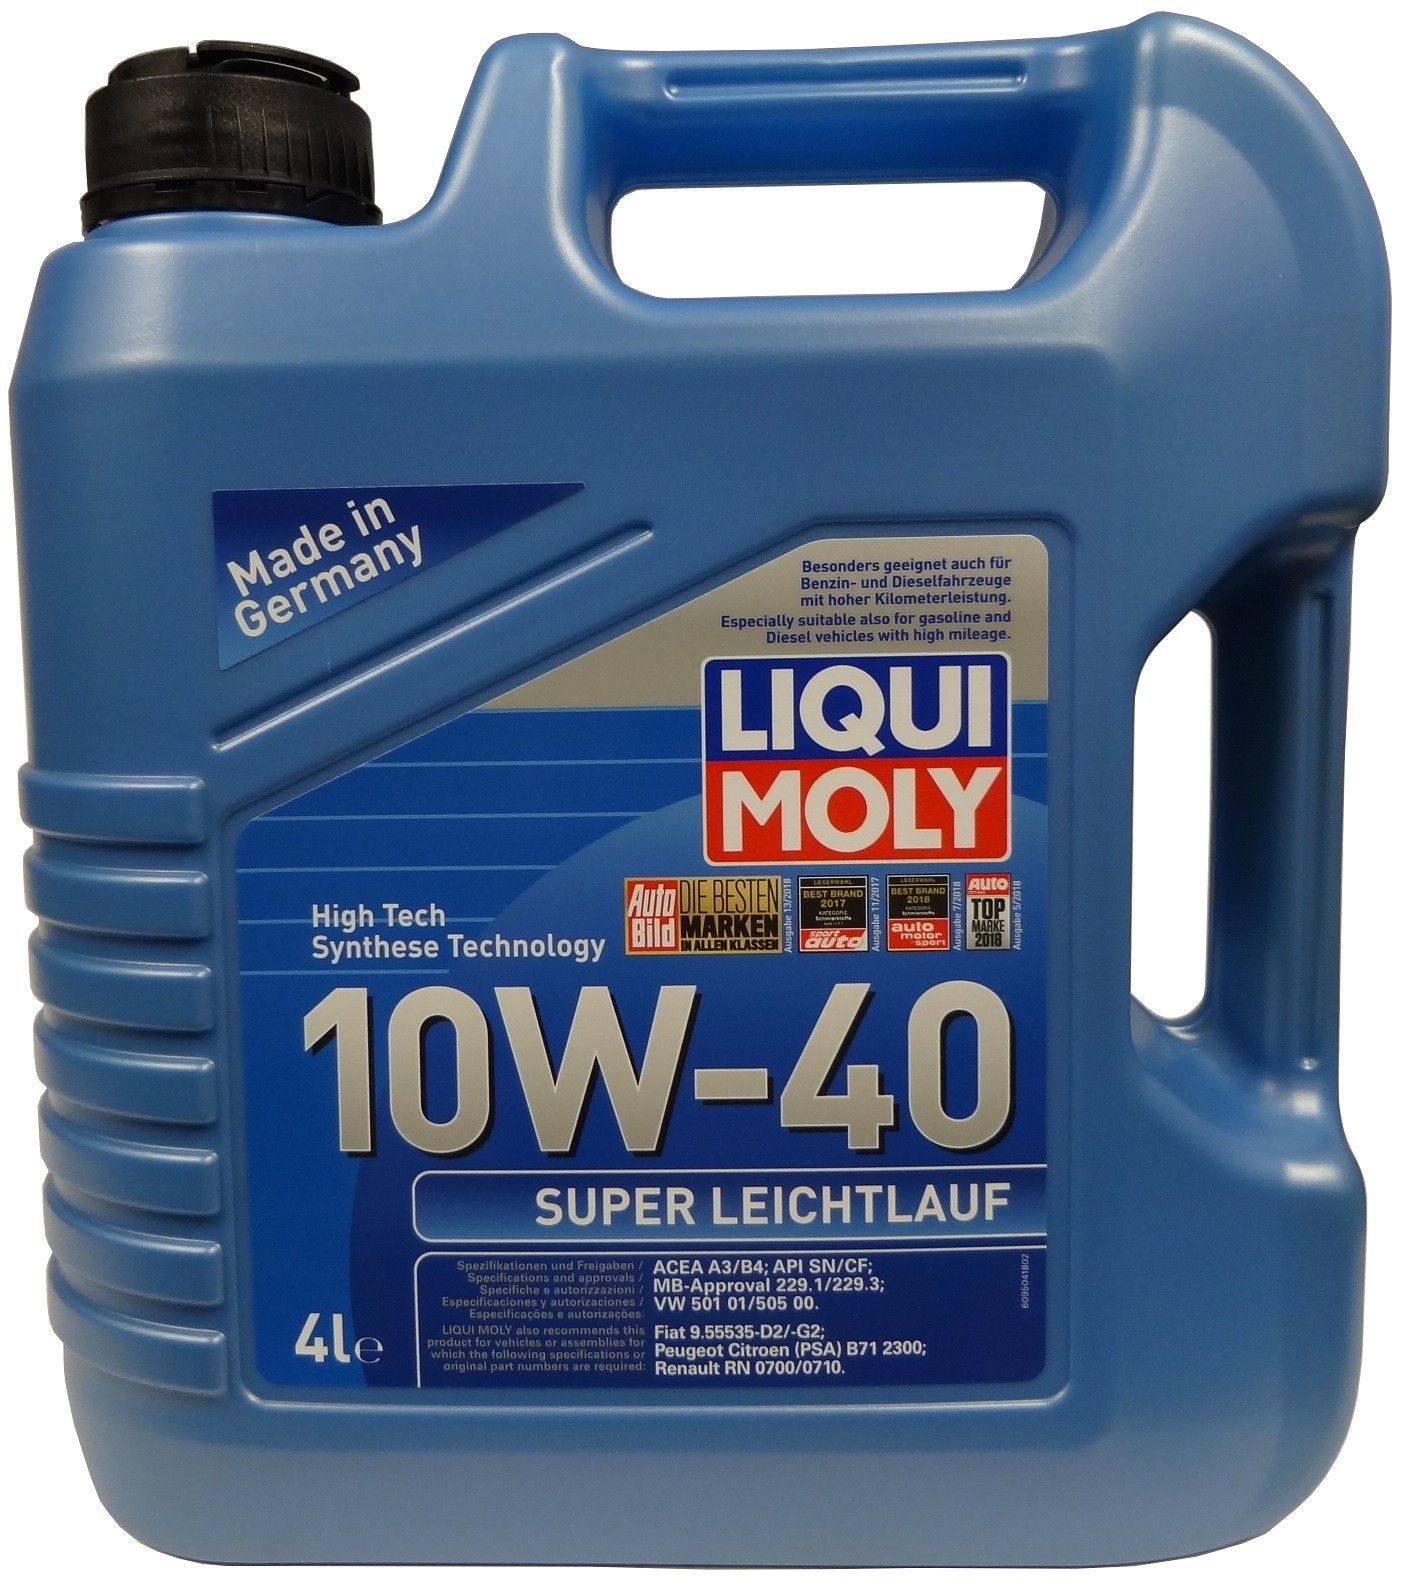 LIQUI MOLY 10W-40 SUPER LEICHTLAUF 4L